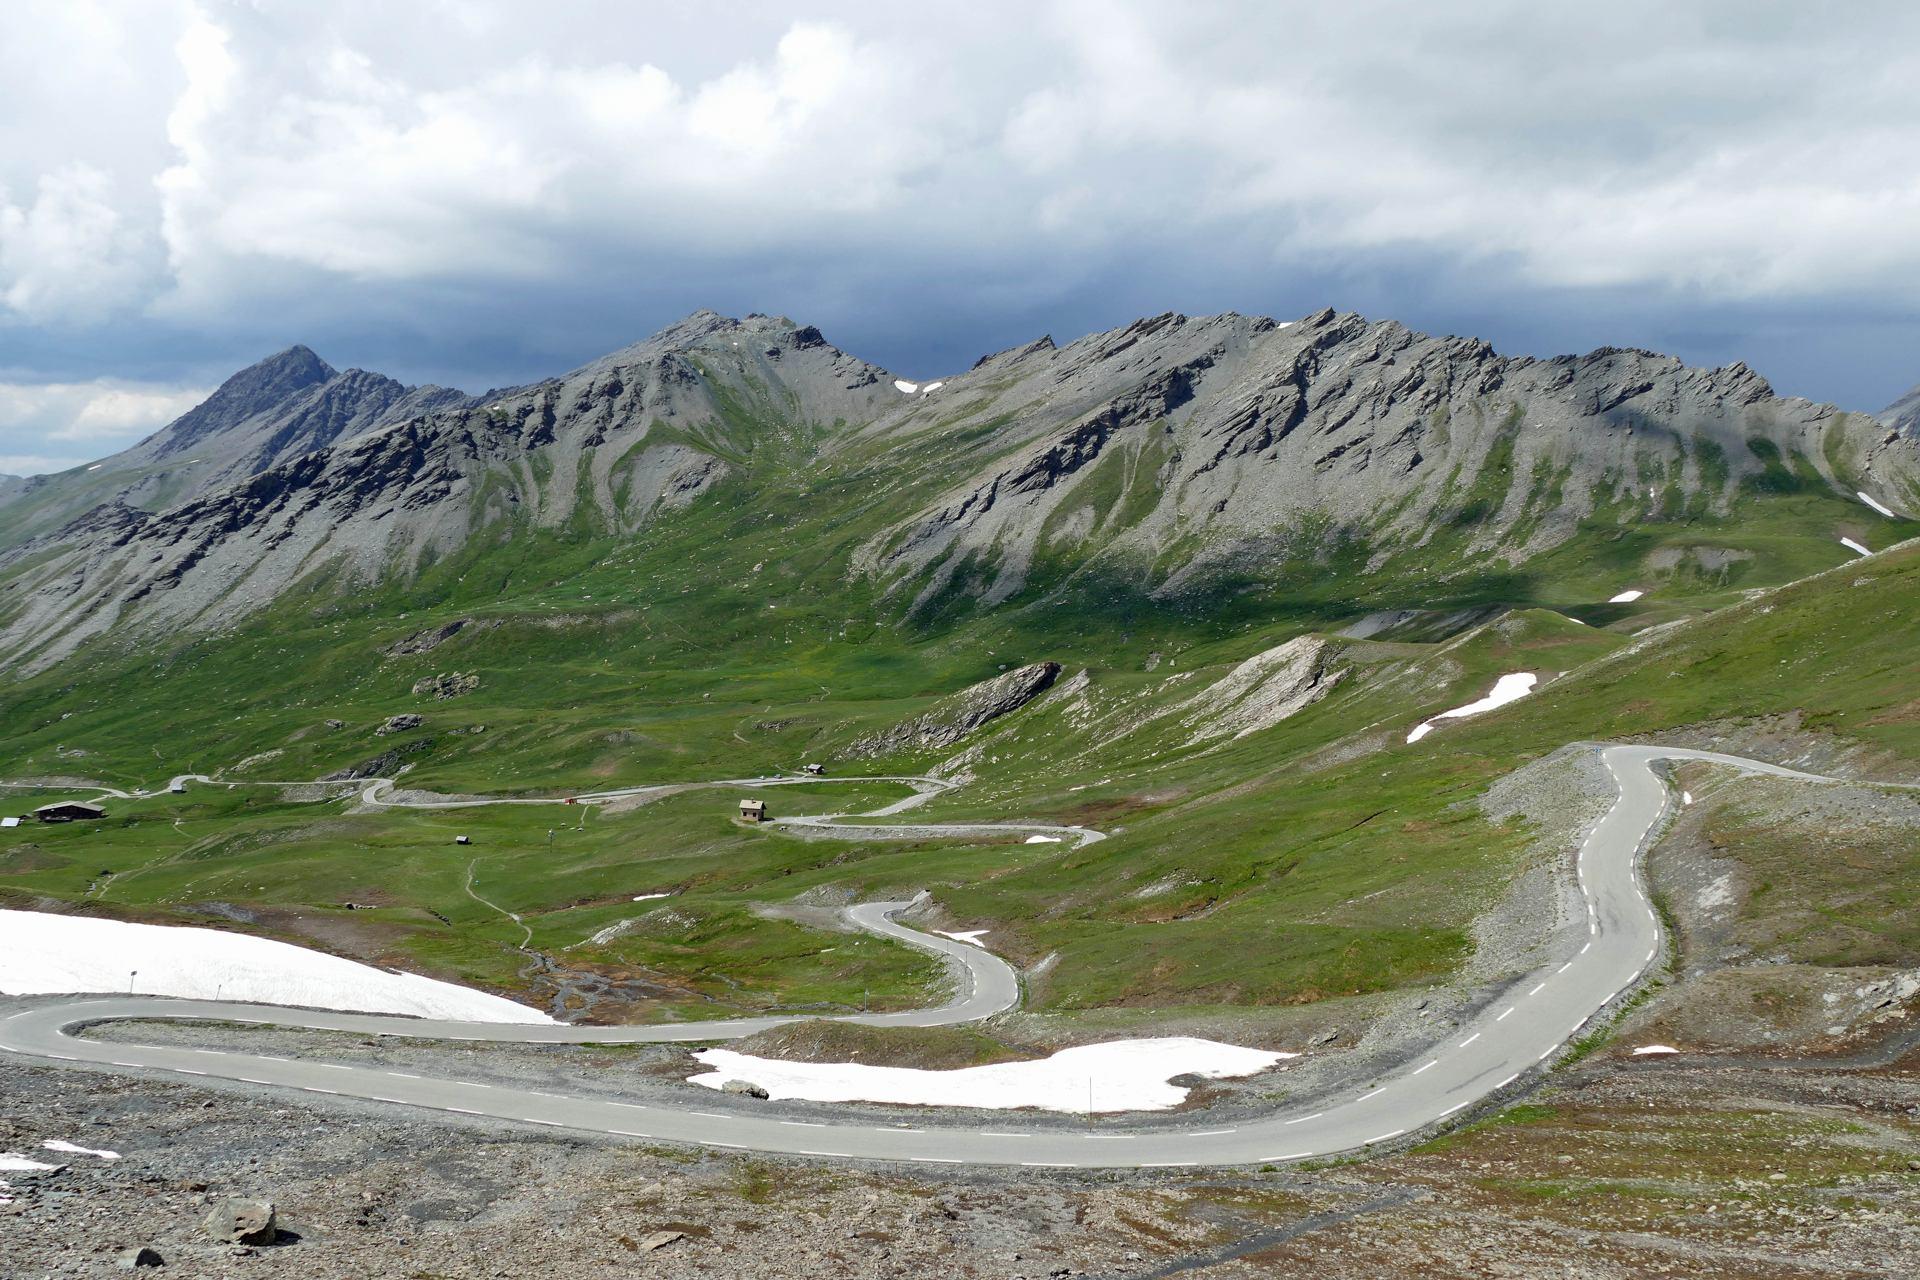 Col Agnel  altitude 2744m - Hautes Alpes